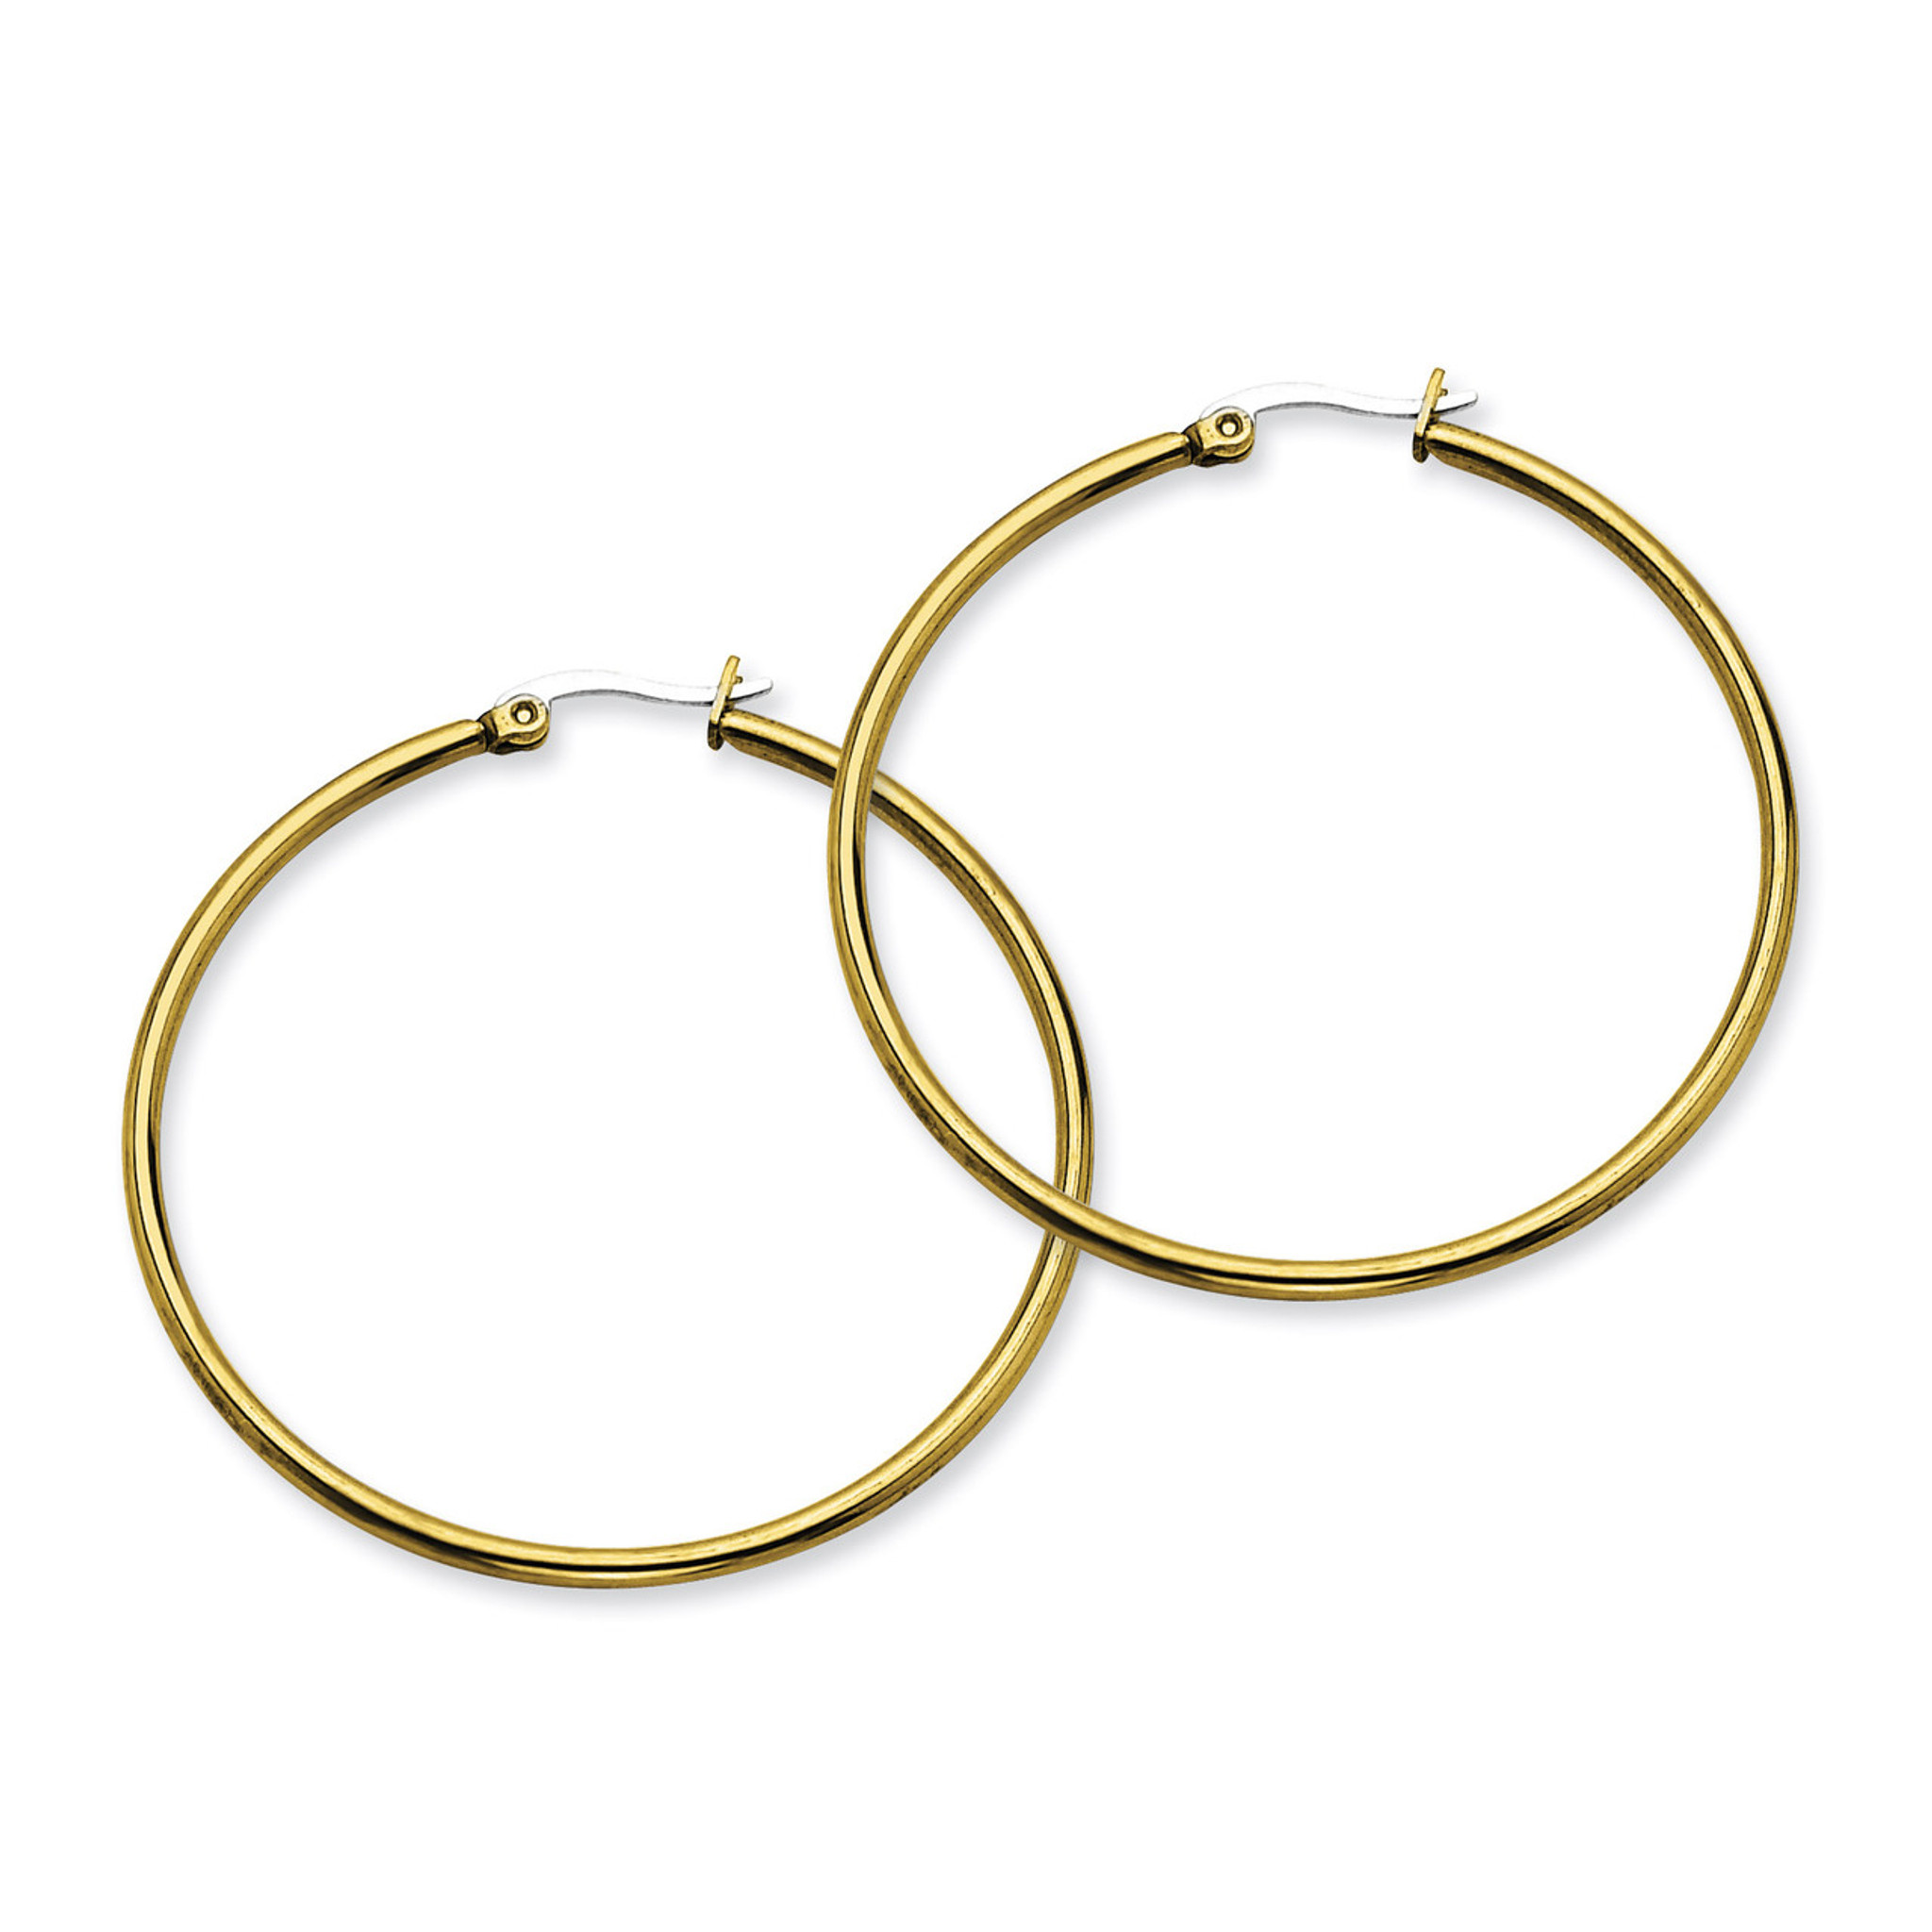 Stainless Steel Polished Yellow IP-plated Post Hoop Earrings